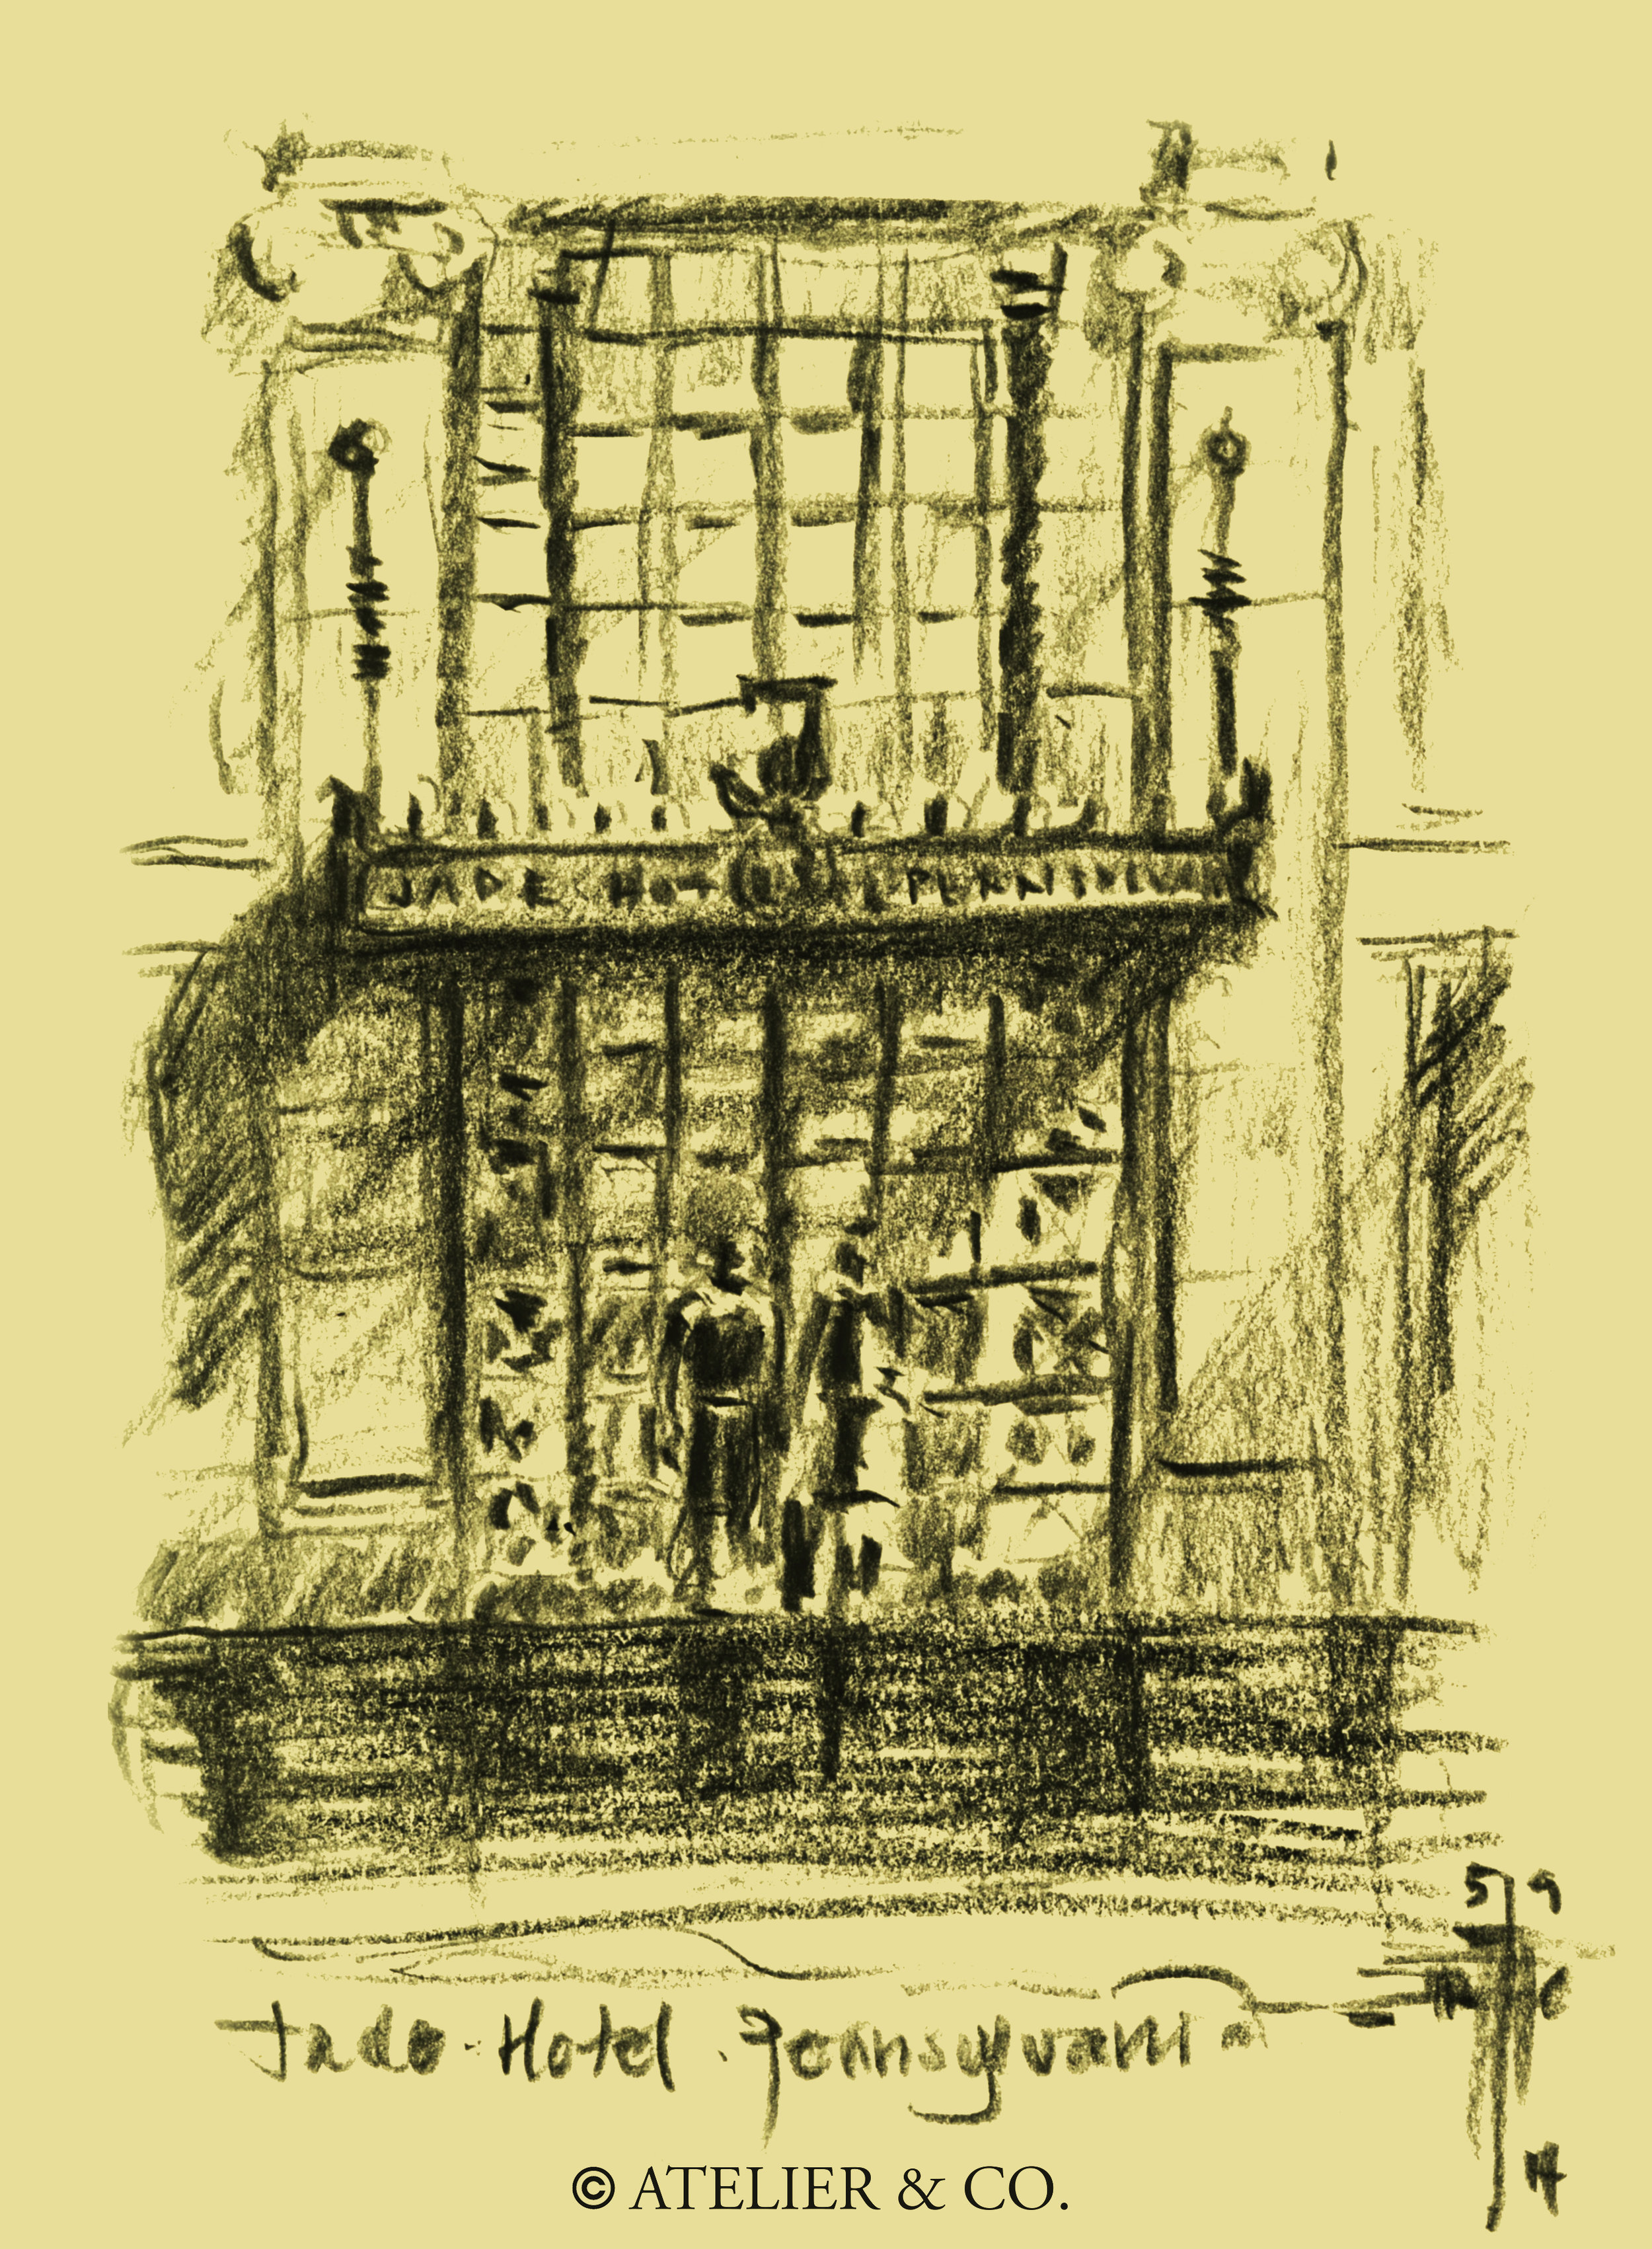 Penn Hotel Sketch1_Copyright.jpg